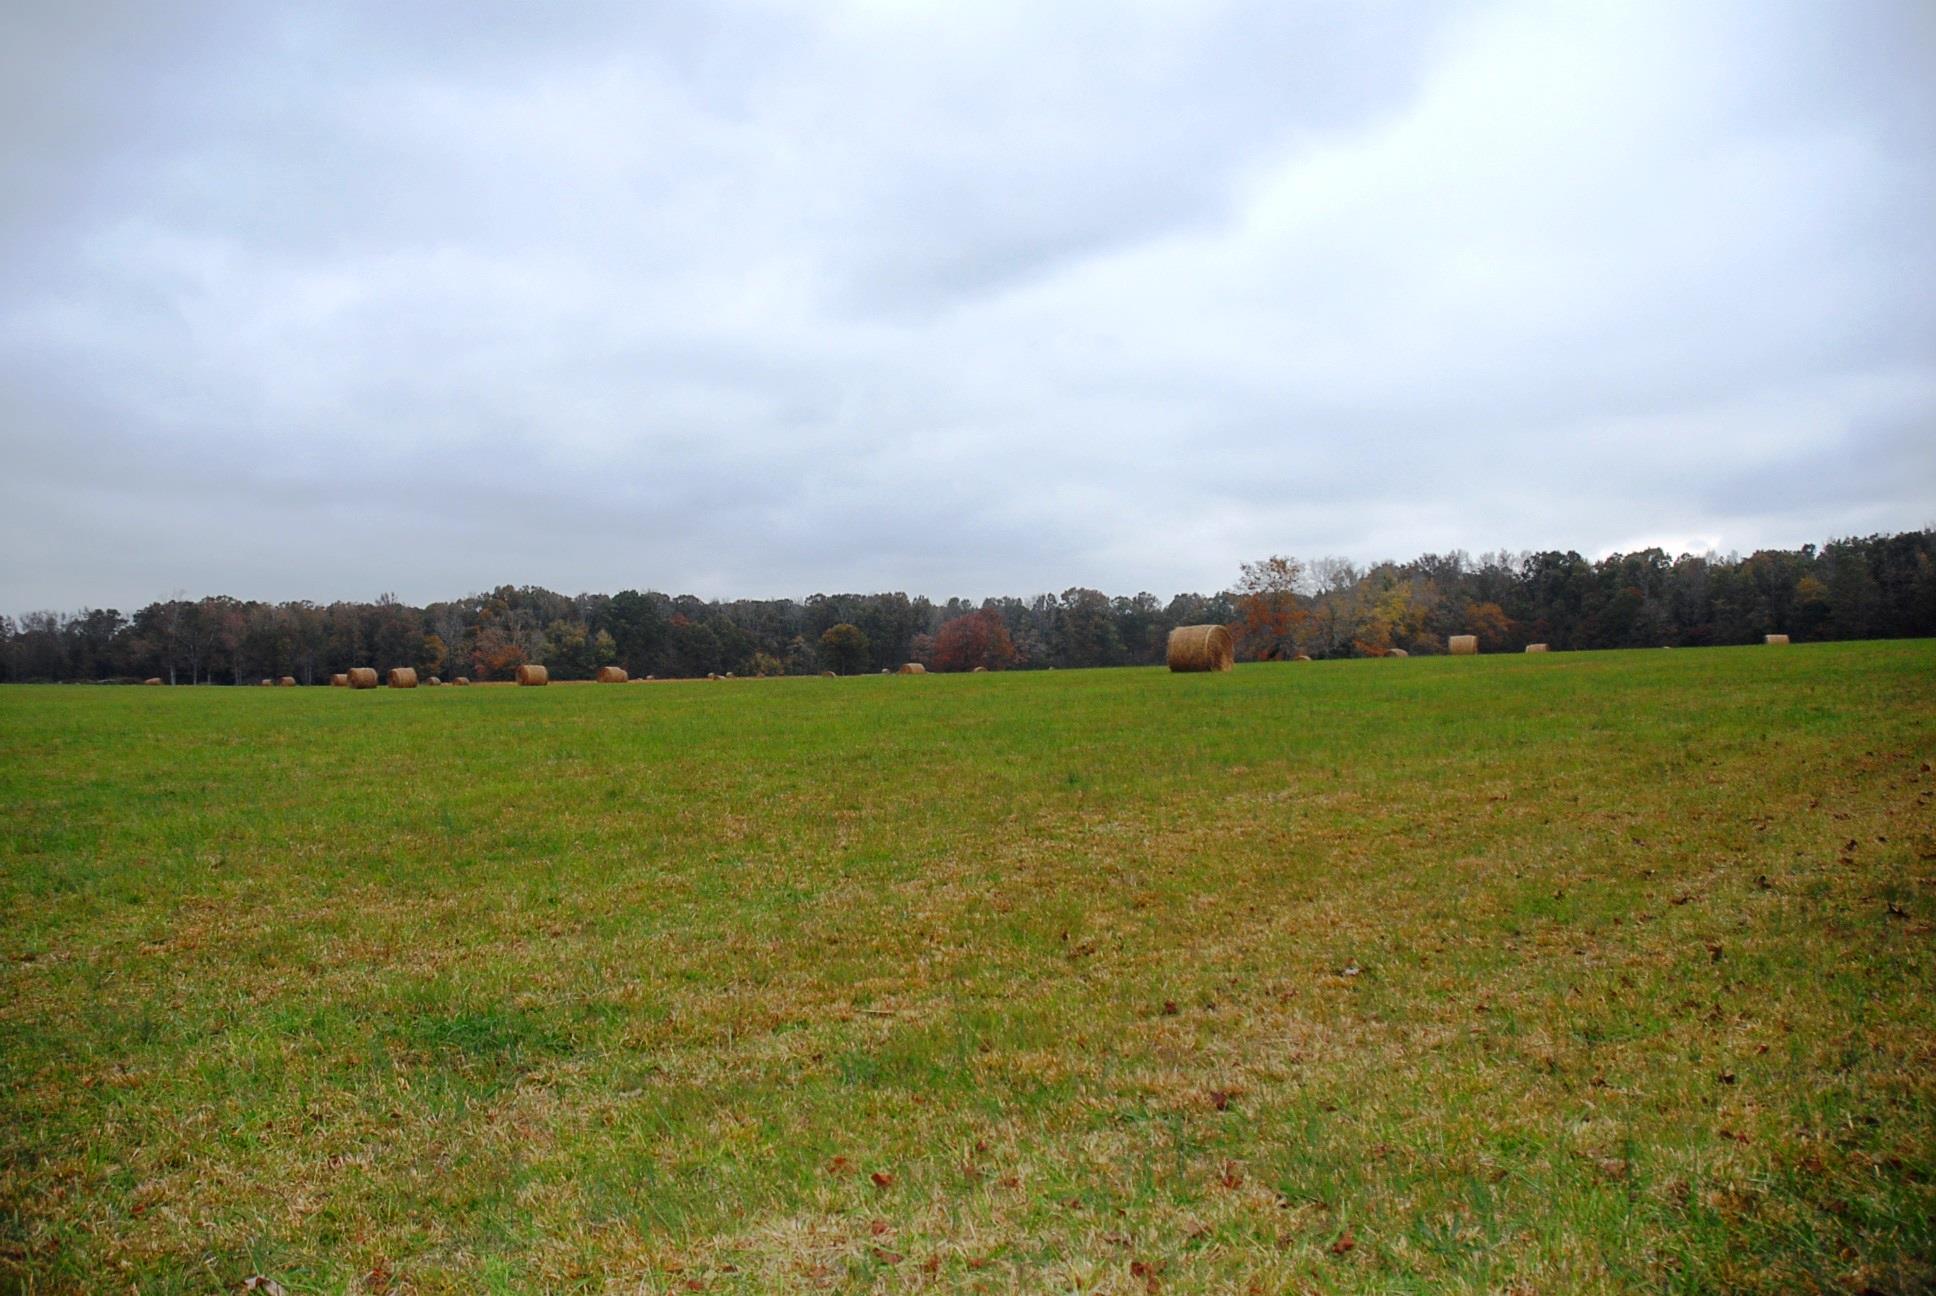 0 Ledford Mill Rd. - 5 Acre, Tullahoma, TN 37388 - Tullahoma, TN real estate listing